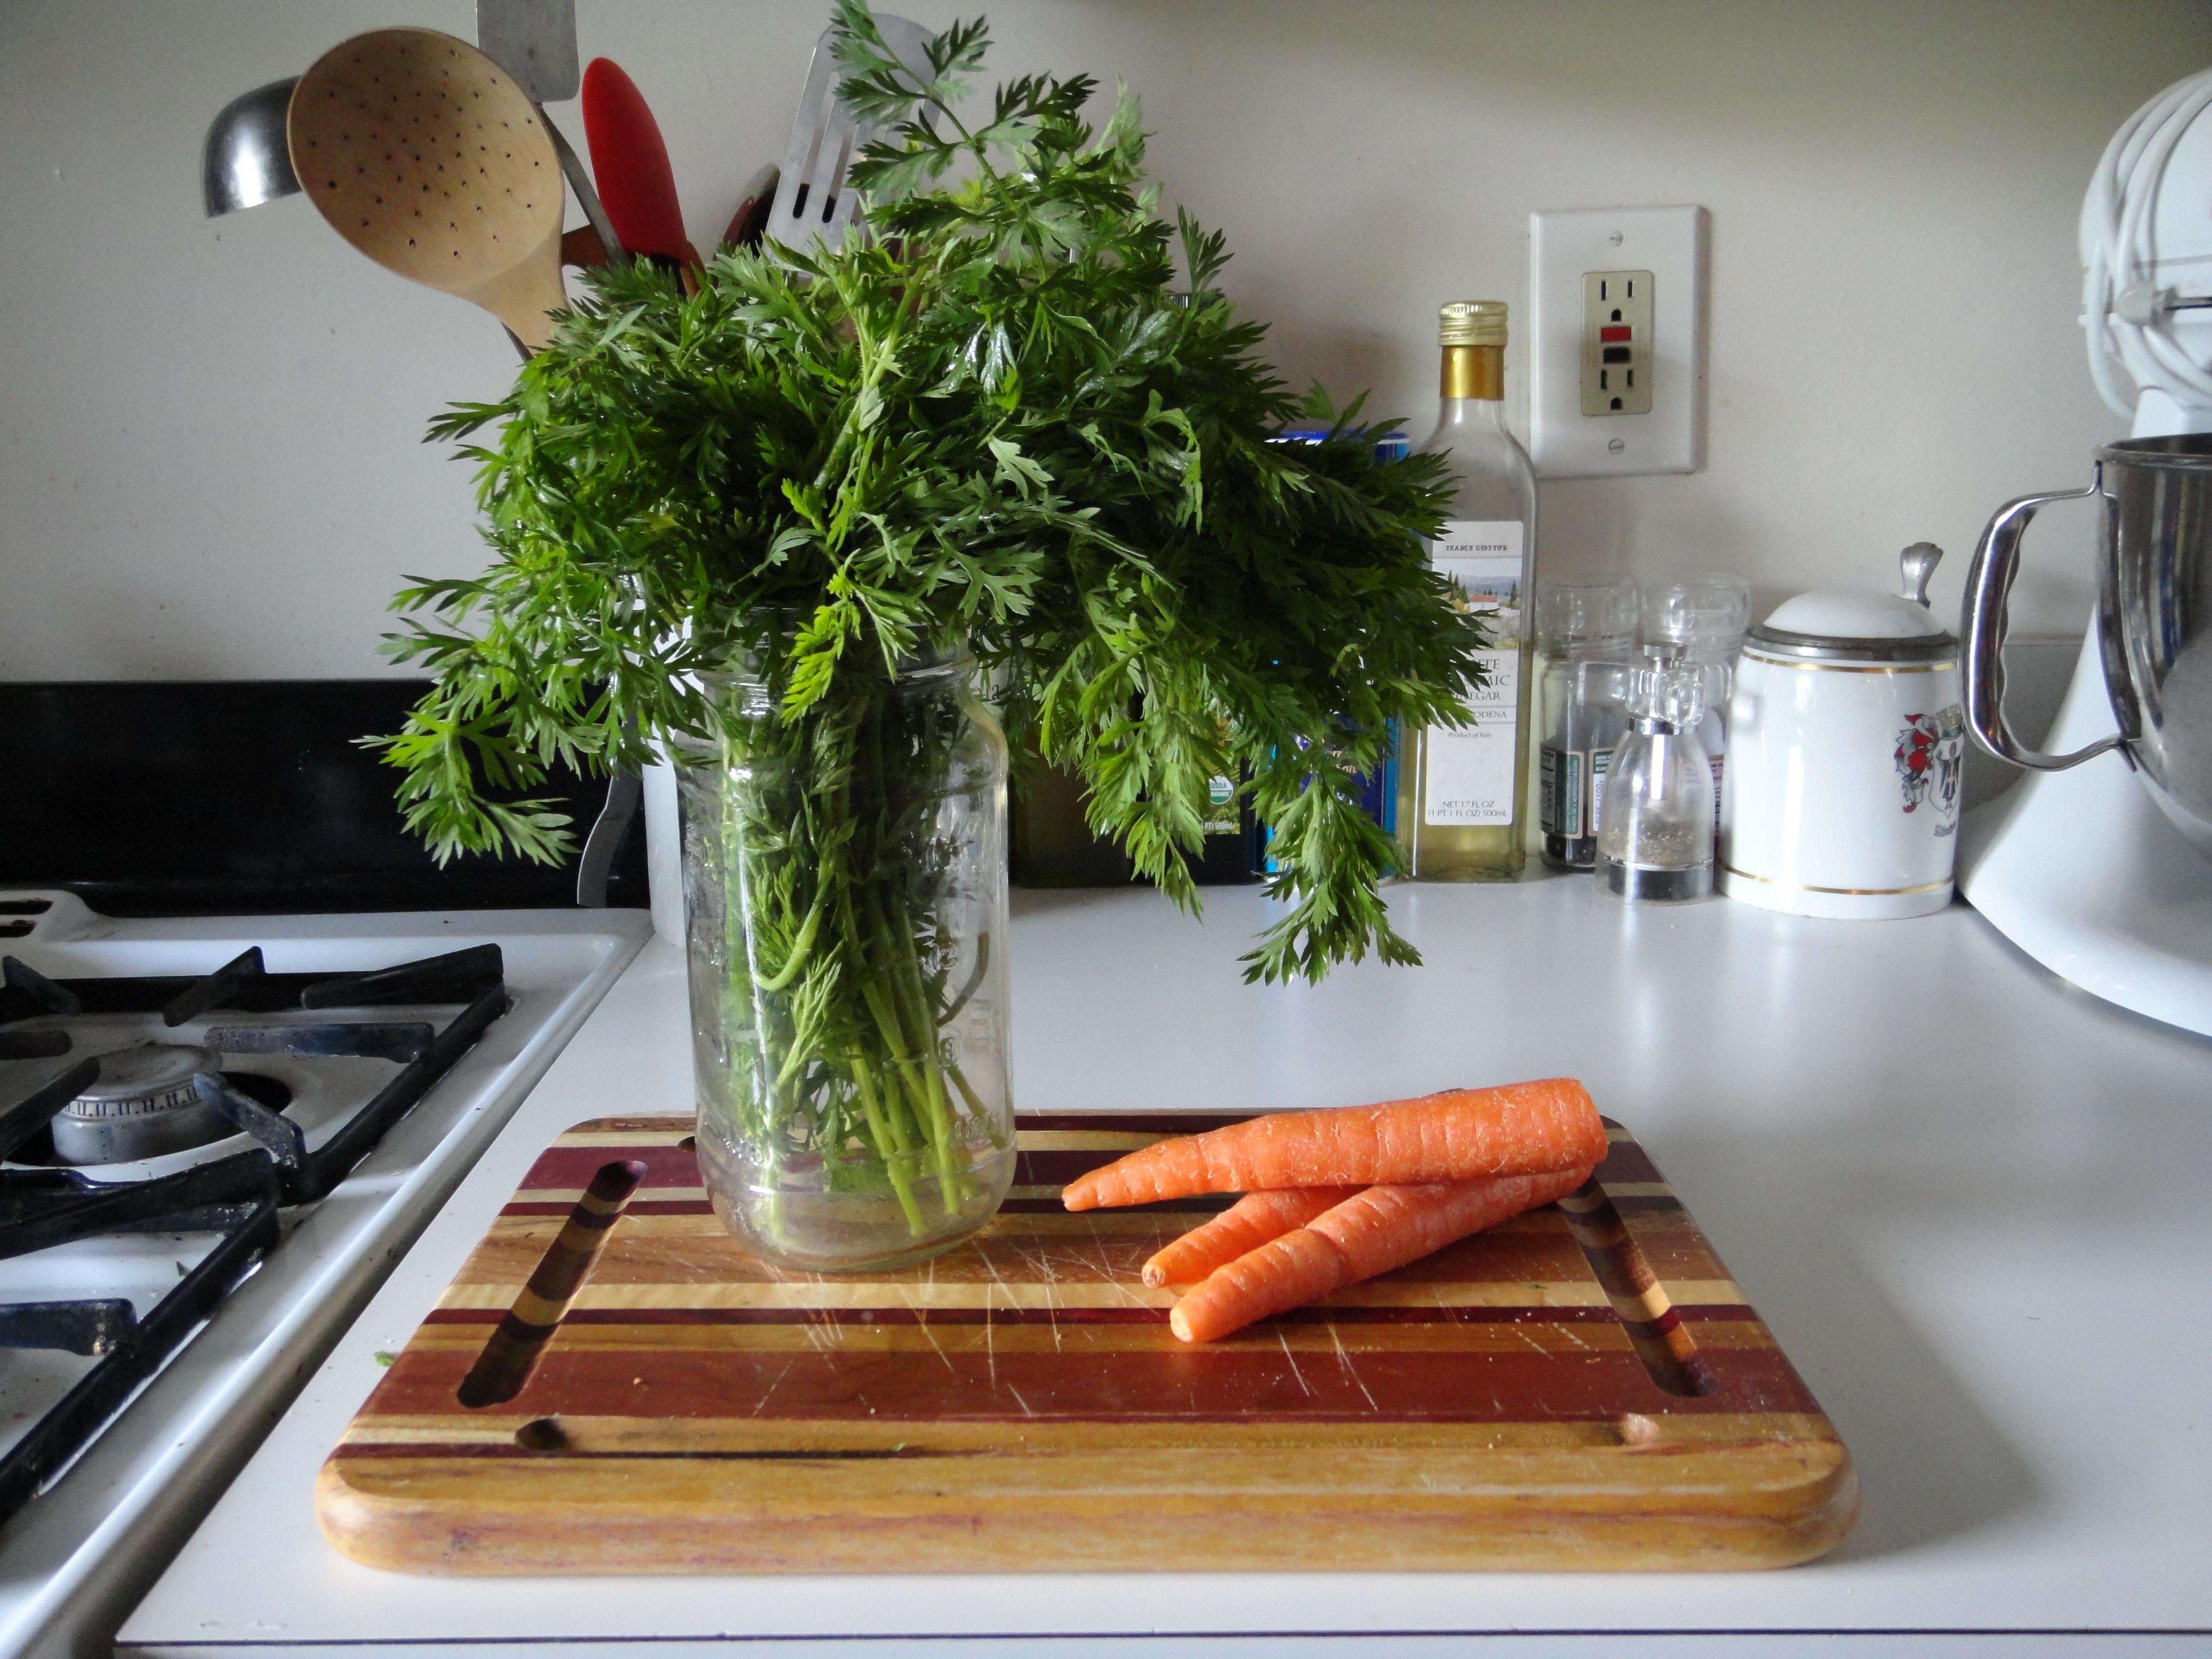 CarrotGreensCounter